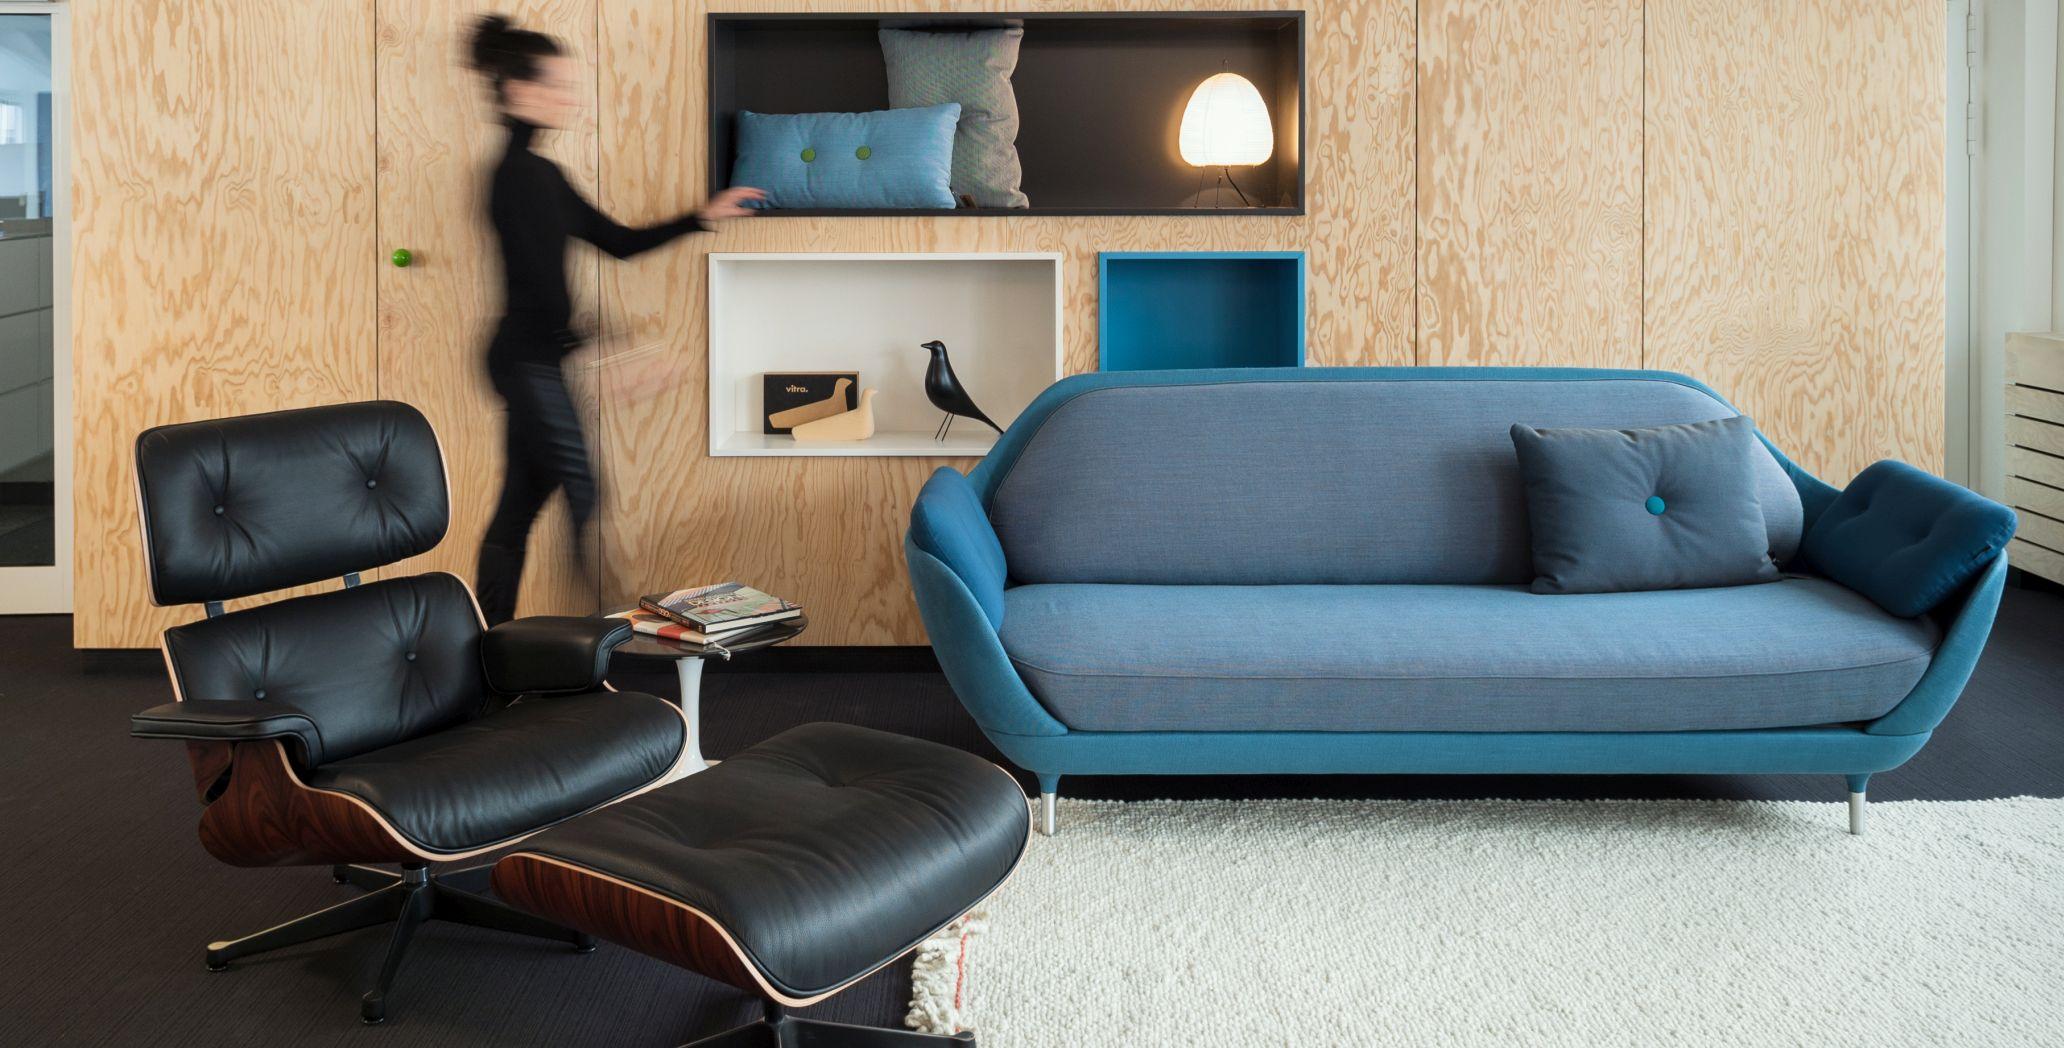 Living room furniture from smow Stuttgart